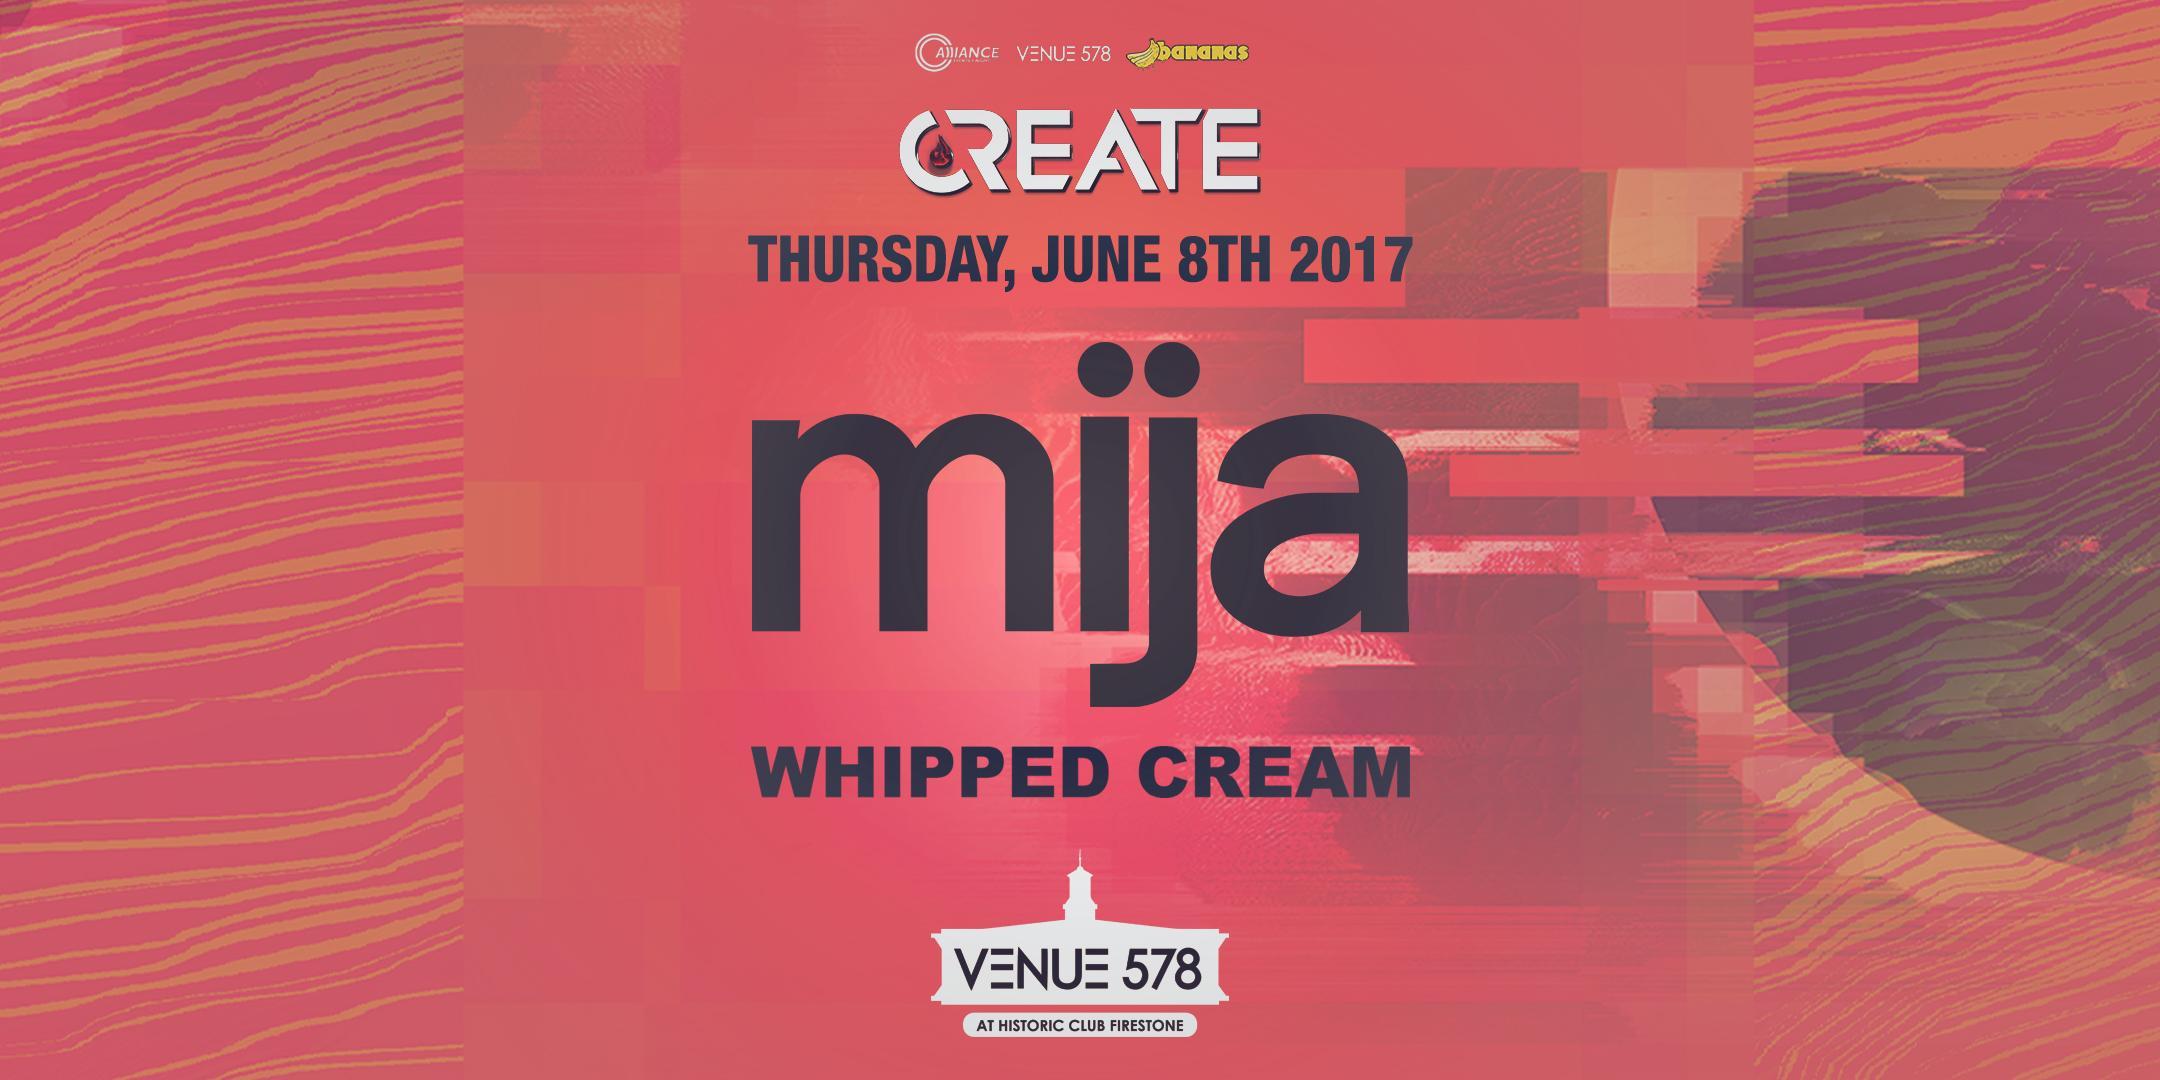 Create - Mija & Whipped Cream - Thursday 06.08.17